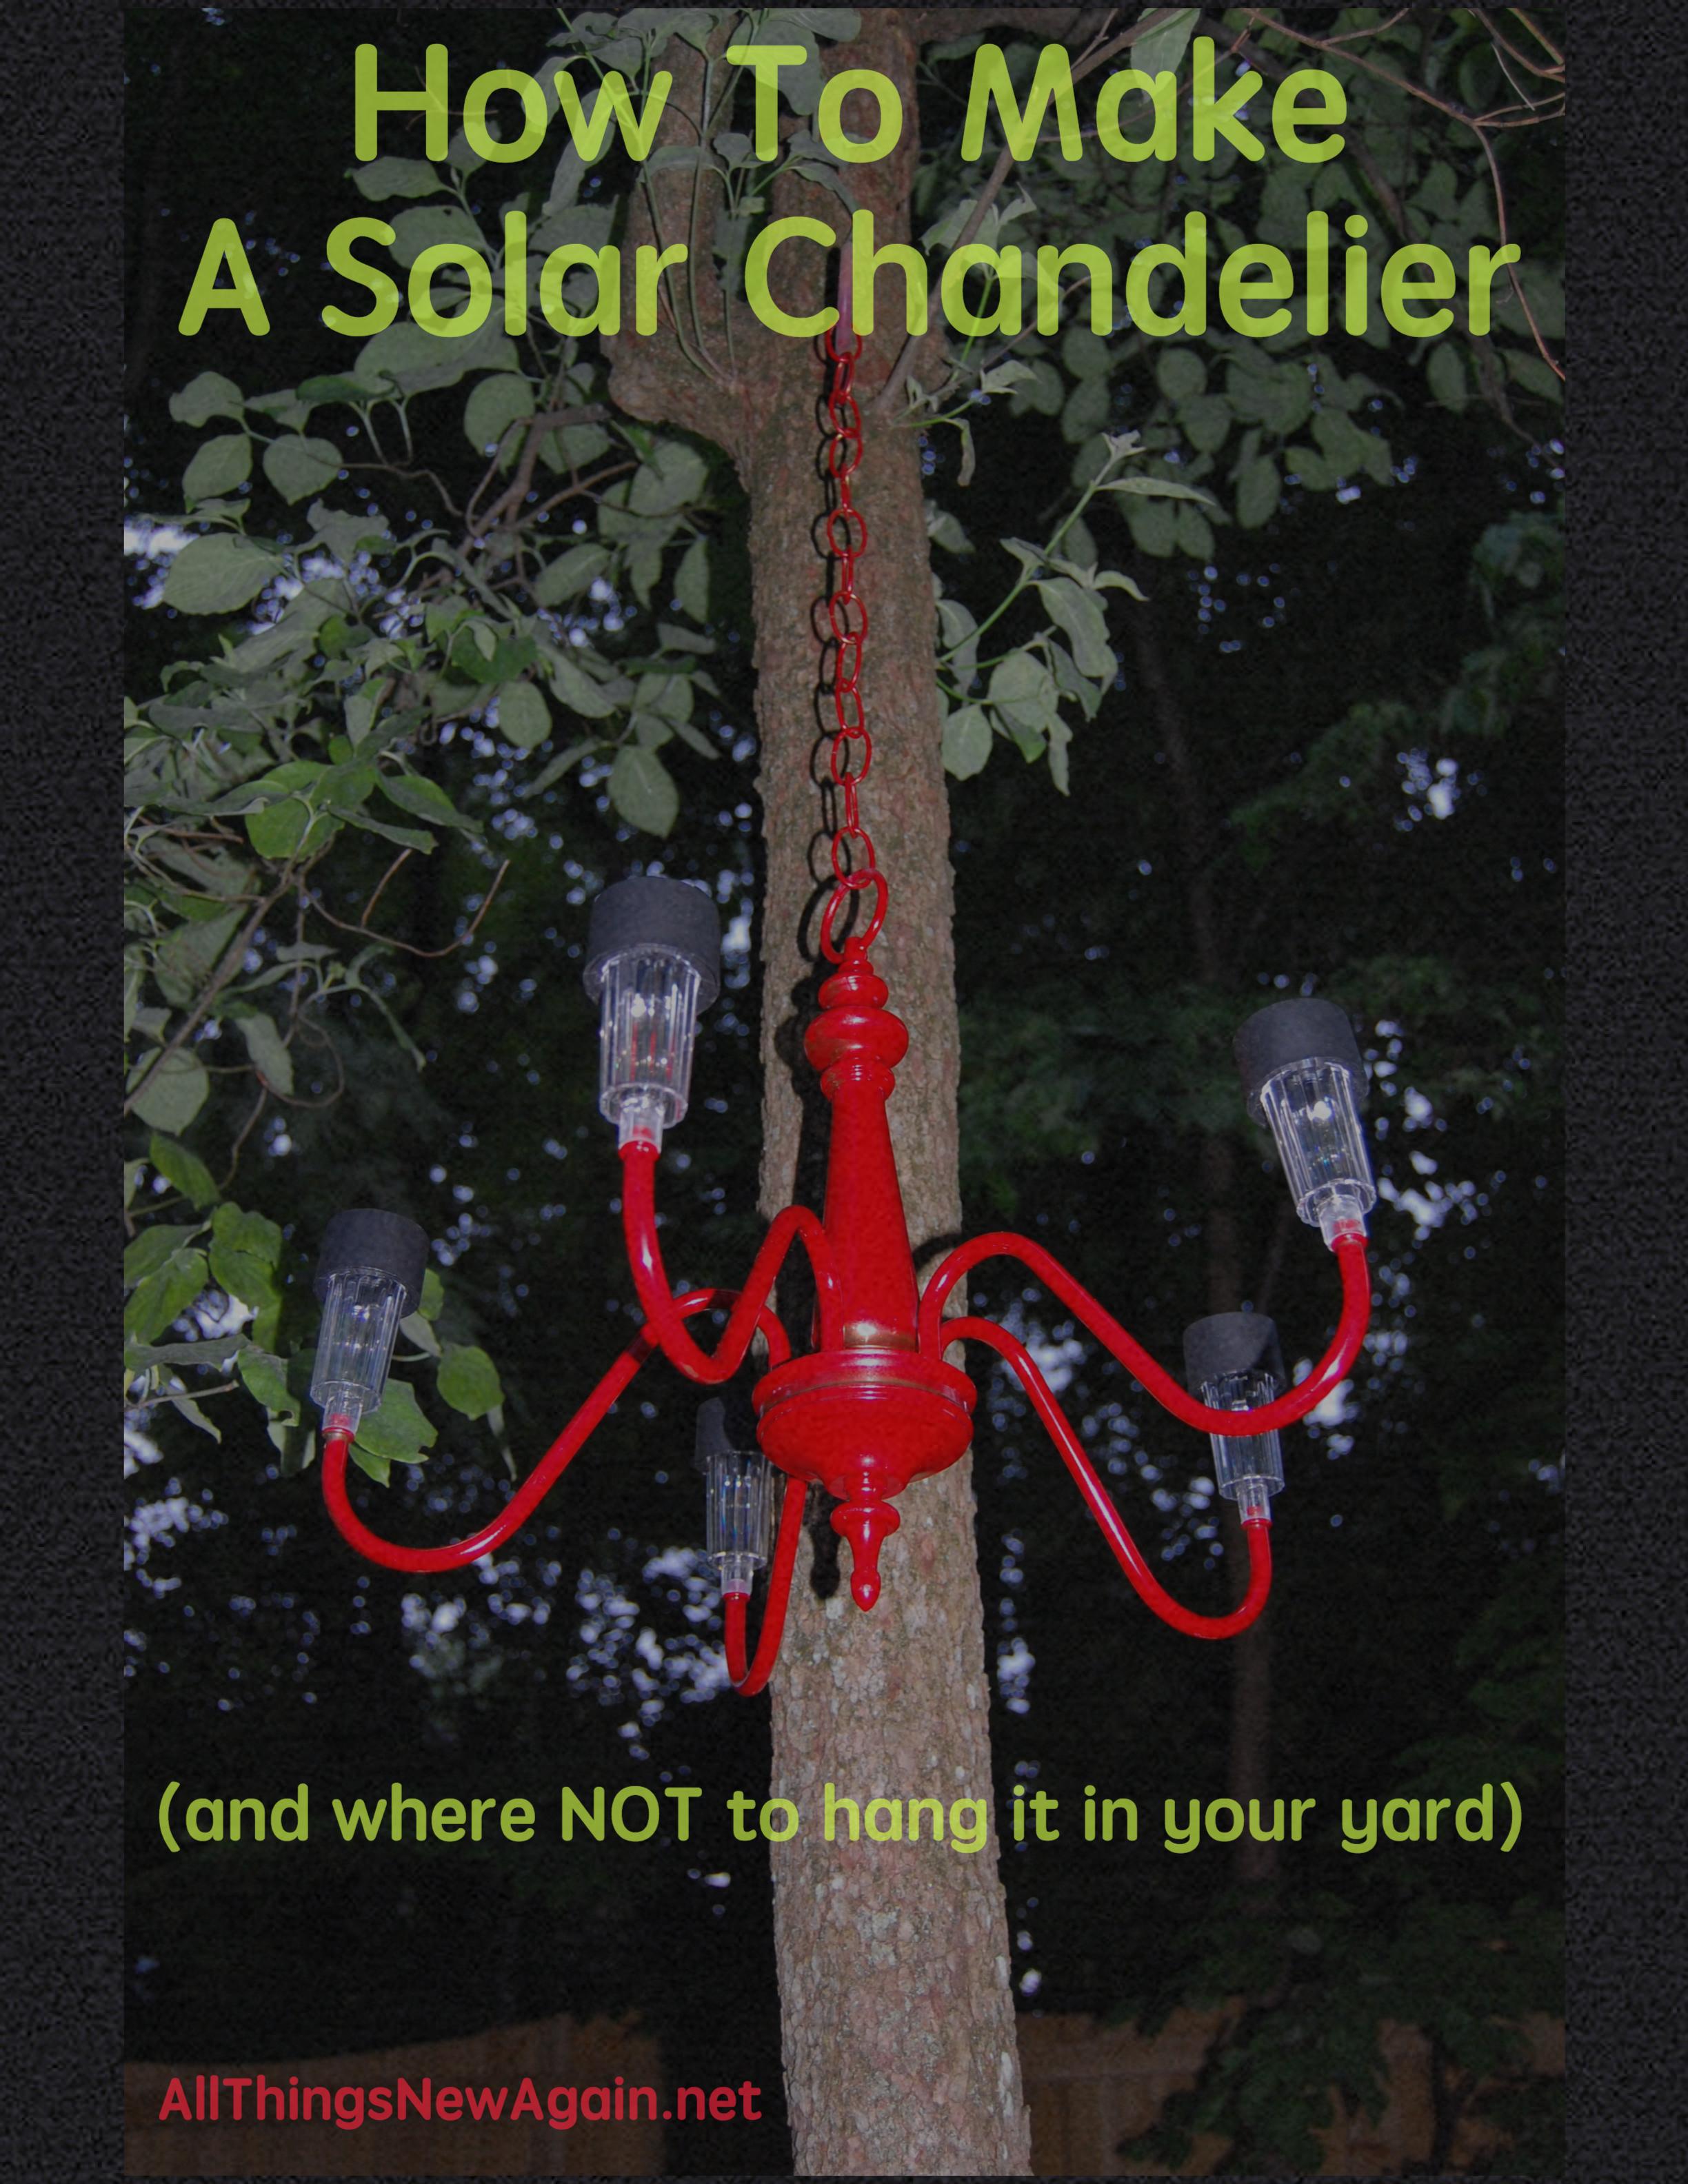 Diy solar chandelier all things new again diy solar chandelier arubaitofo Choice Image